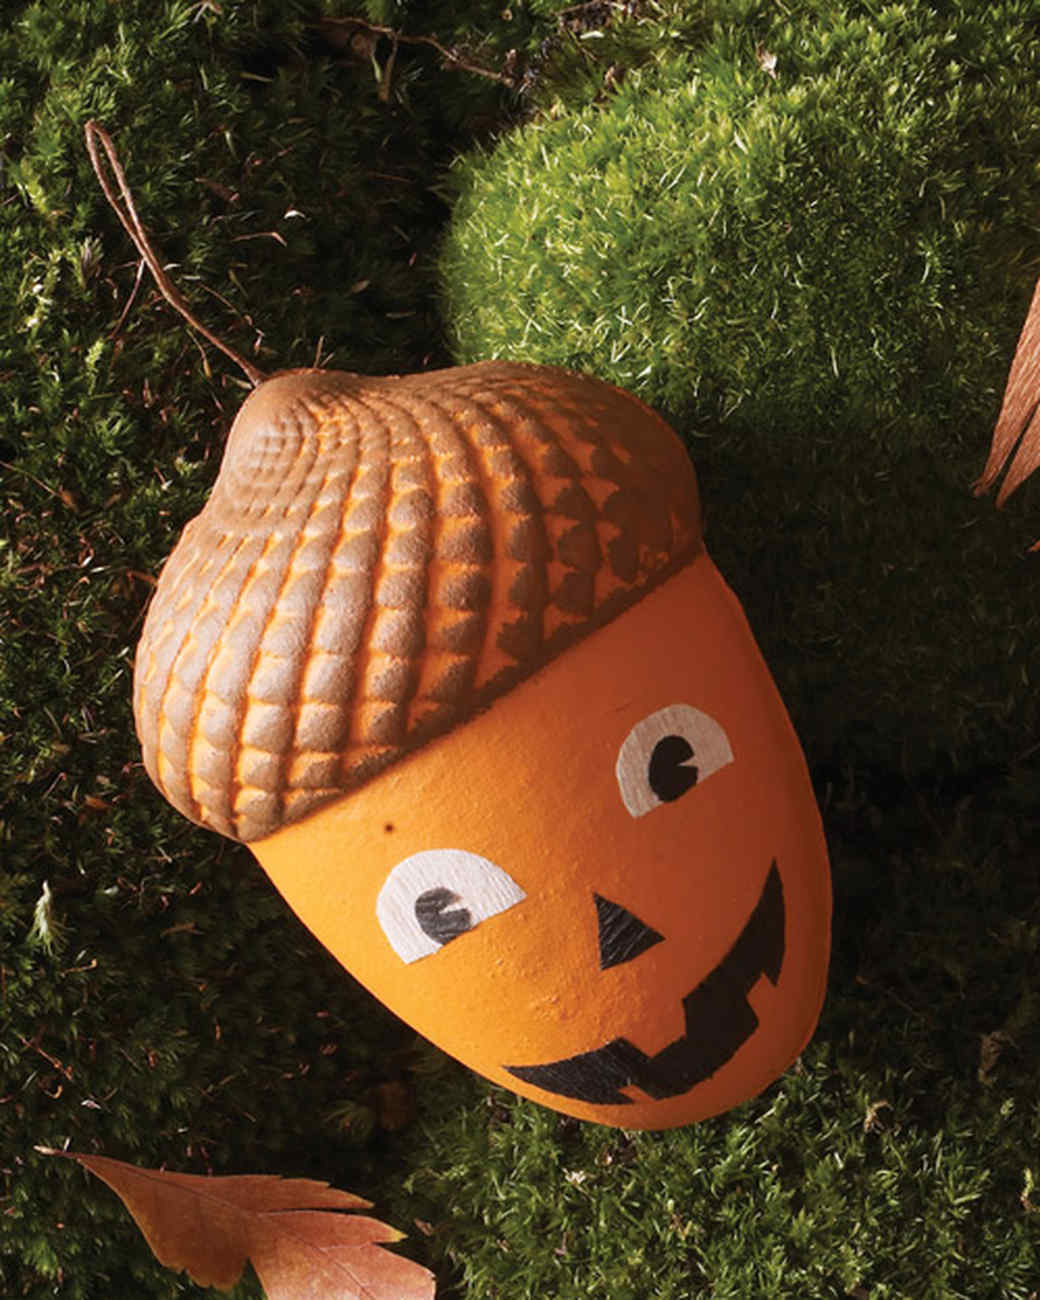 mld104954_1009_acorn.jpg